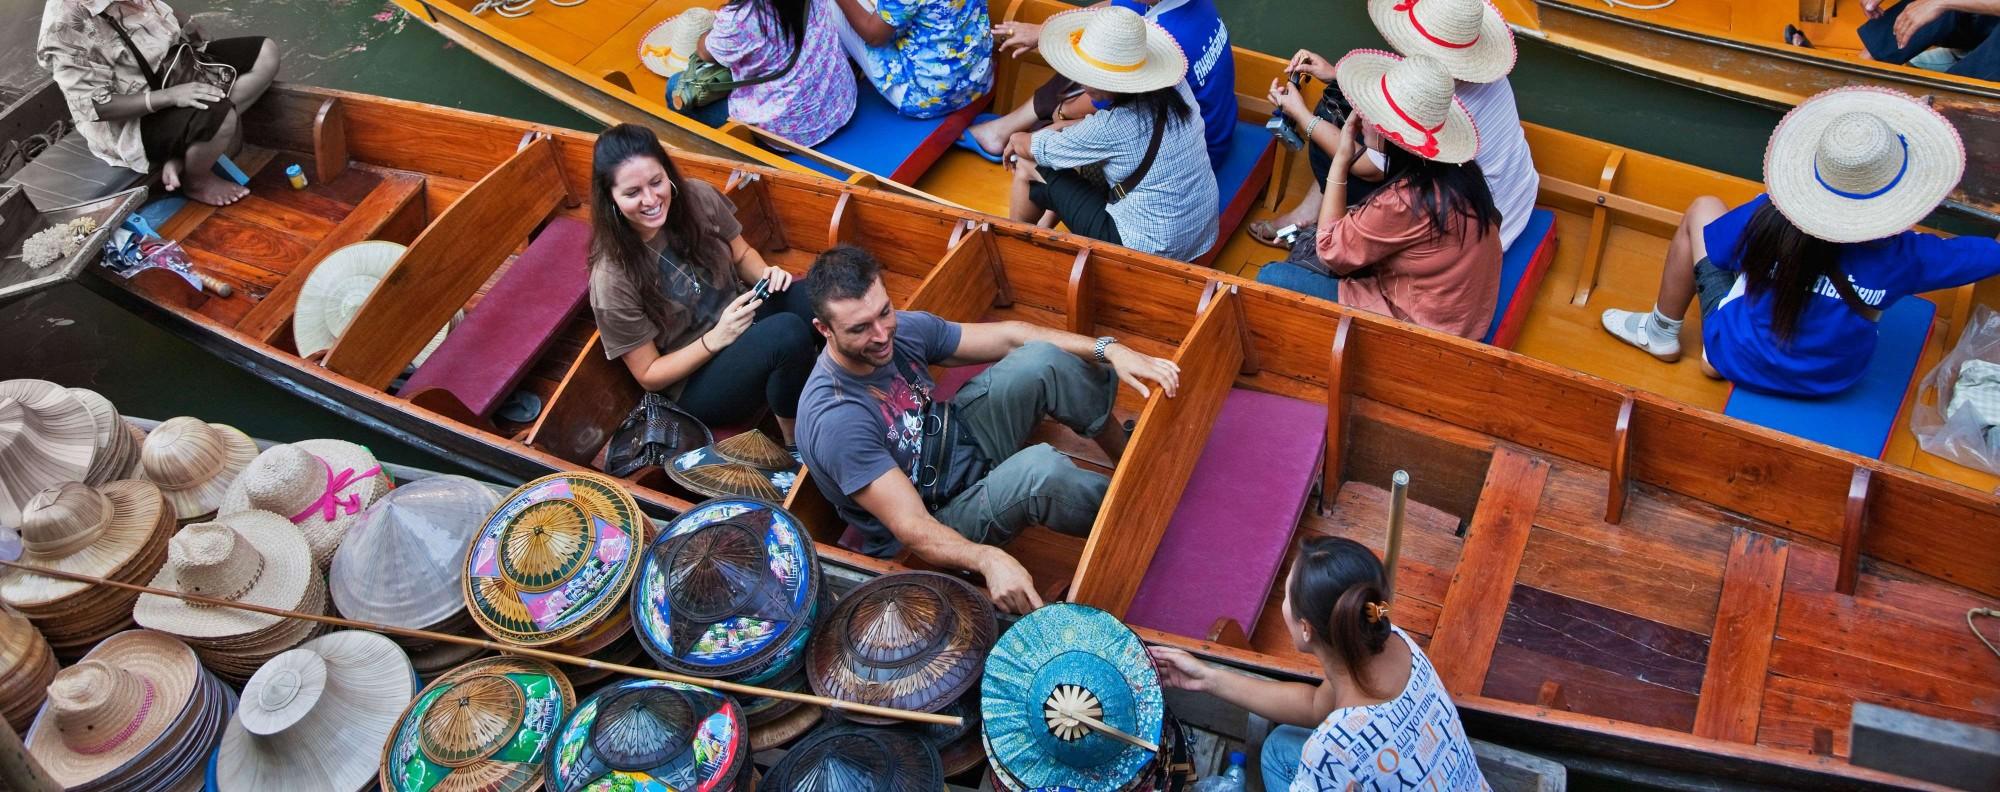 Visiting a floating market is a popular Bangkok pastime.